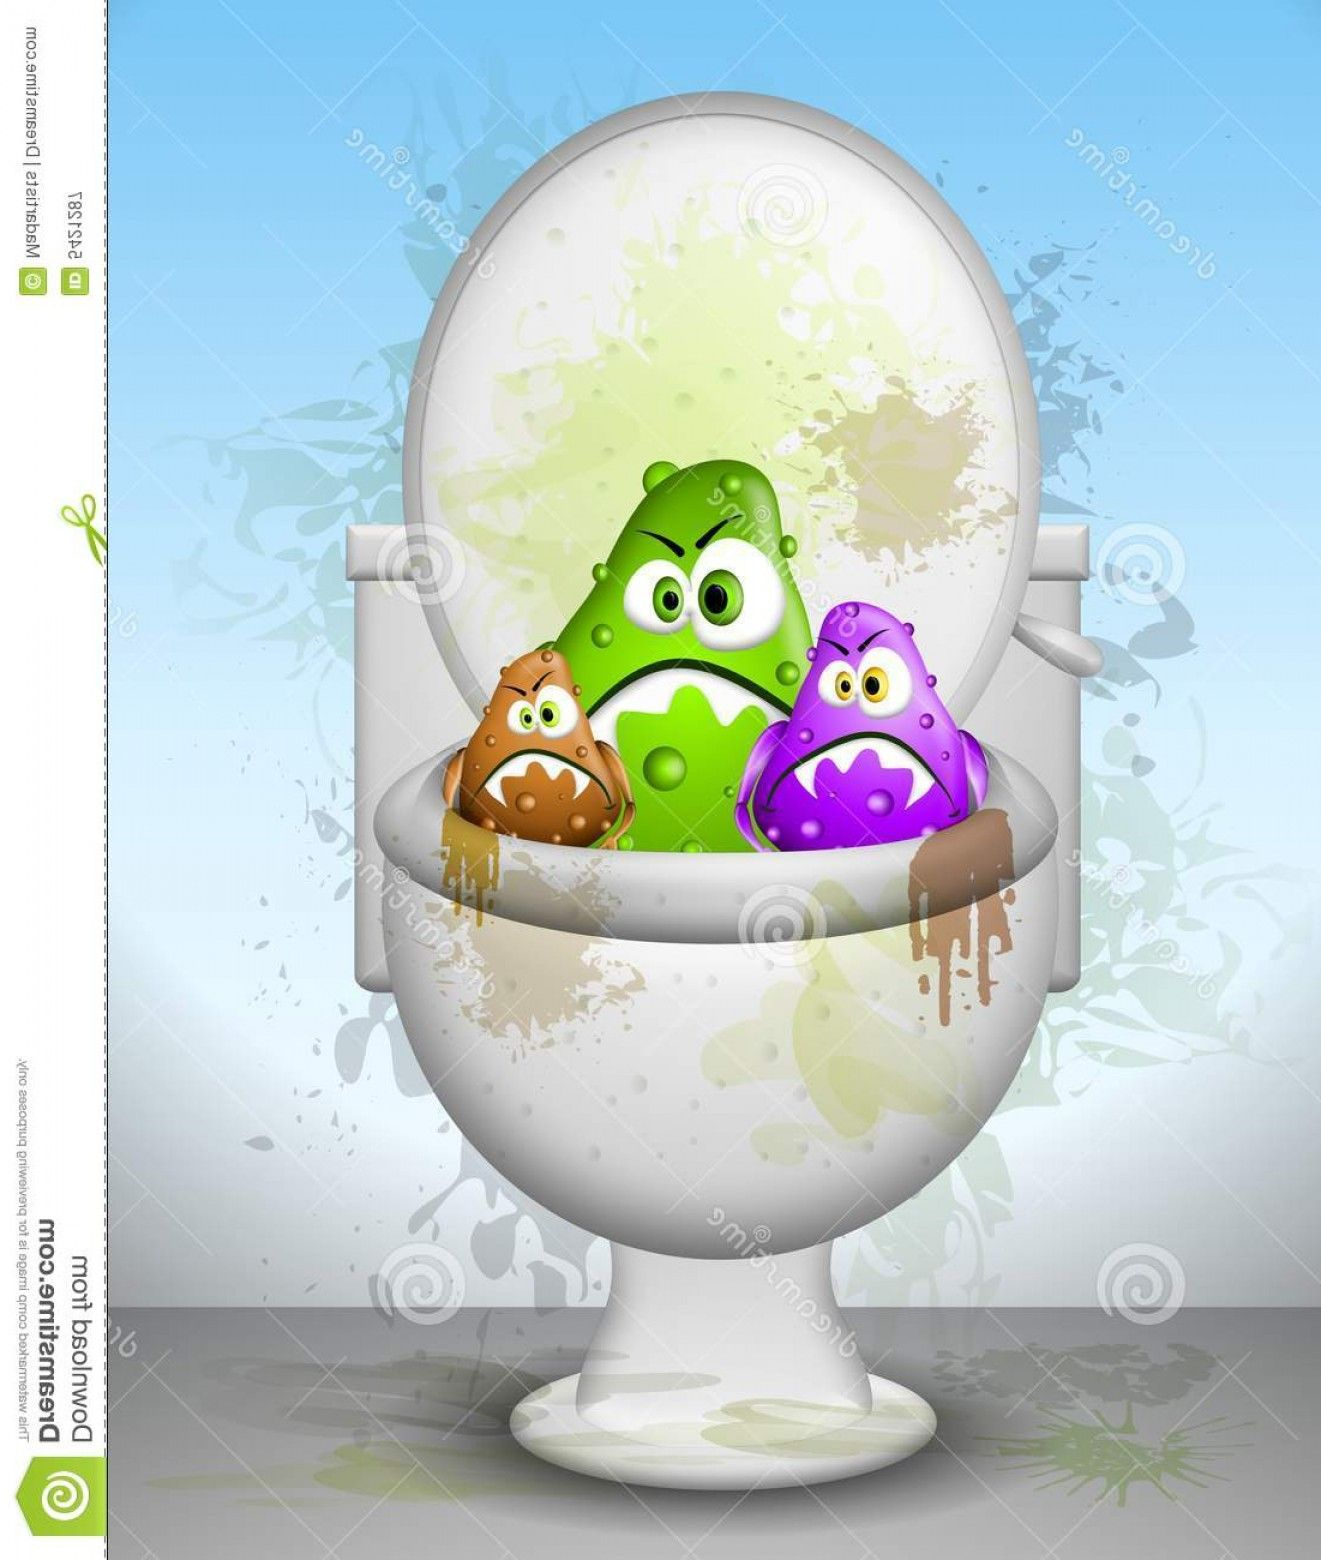 Dirty Bathroom Pics: Cartoons Dirty Bathrooms: Royalty Free Stock Photography